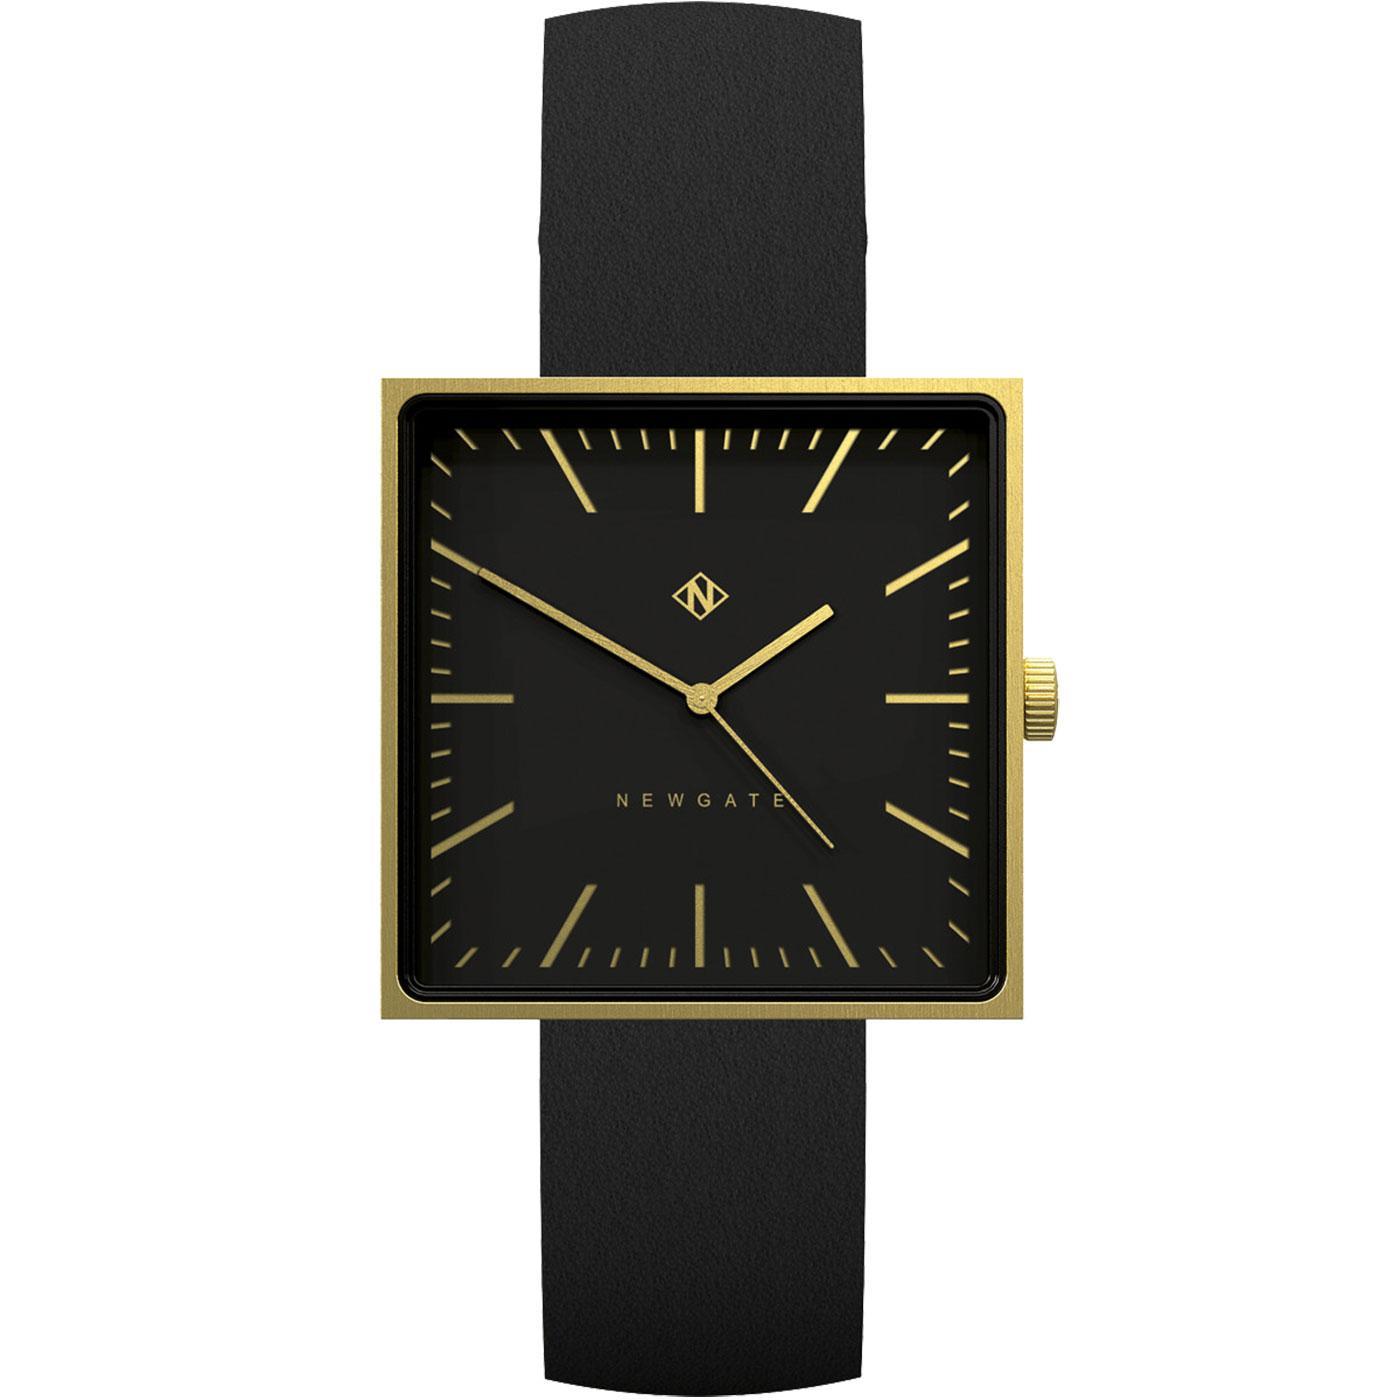 The Cubeline NEWGATE CLOCKS Retro Watch Black